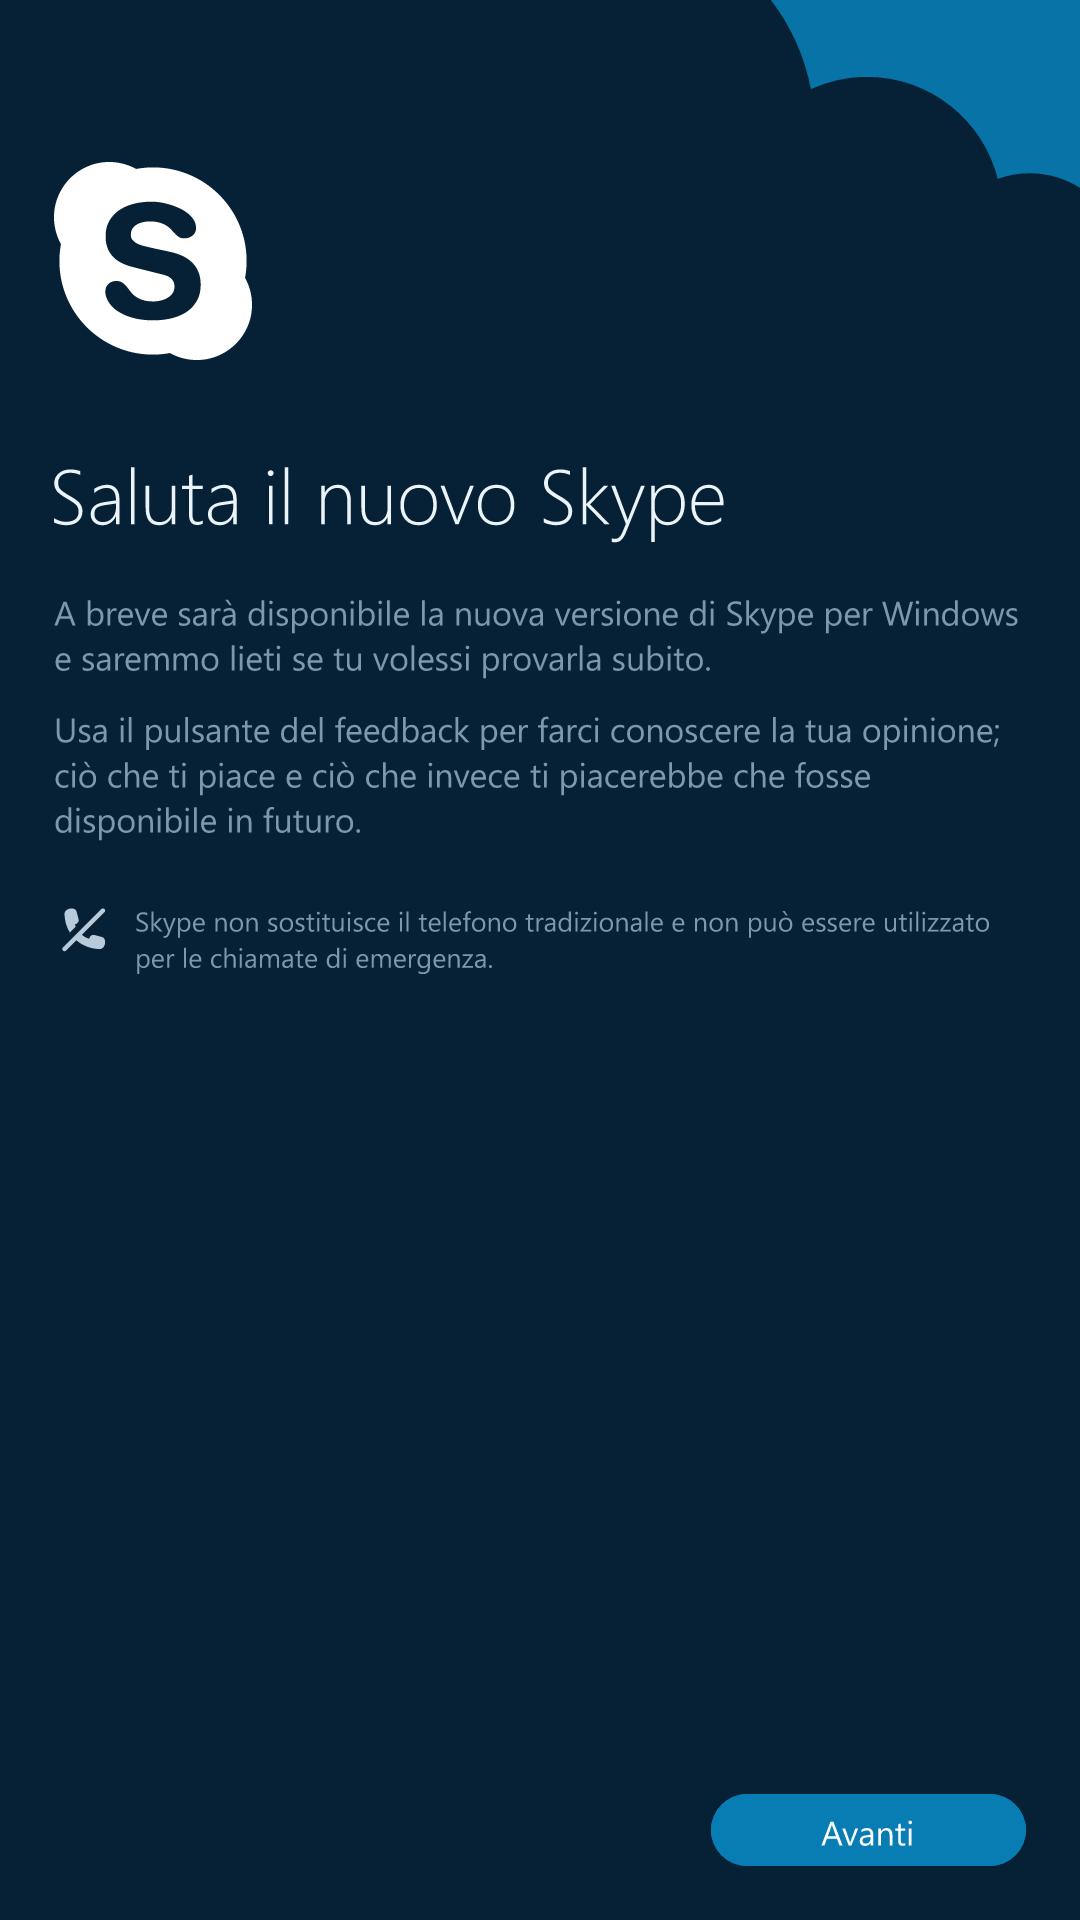 Skype - Windows 10 Mobile - 1